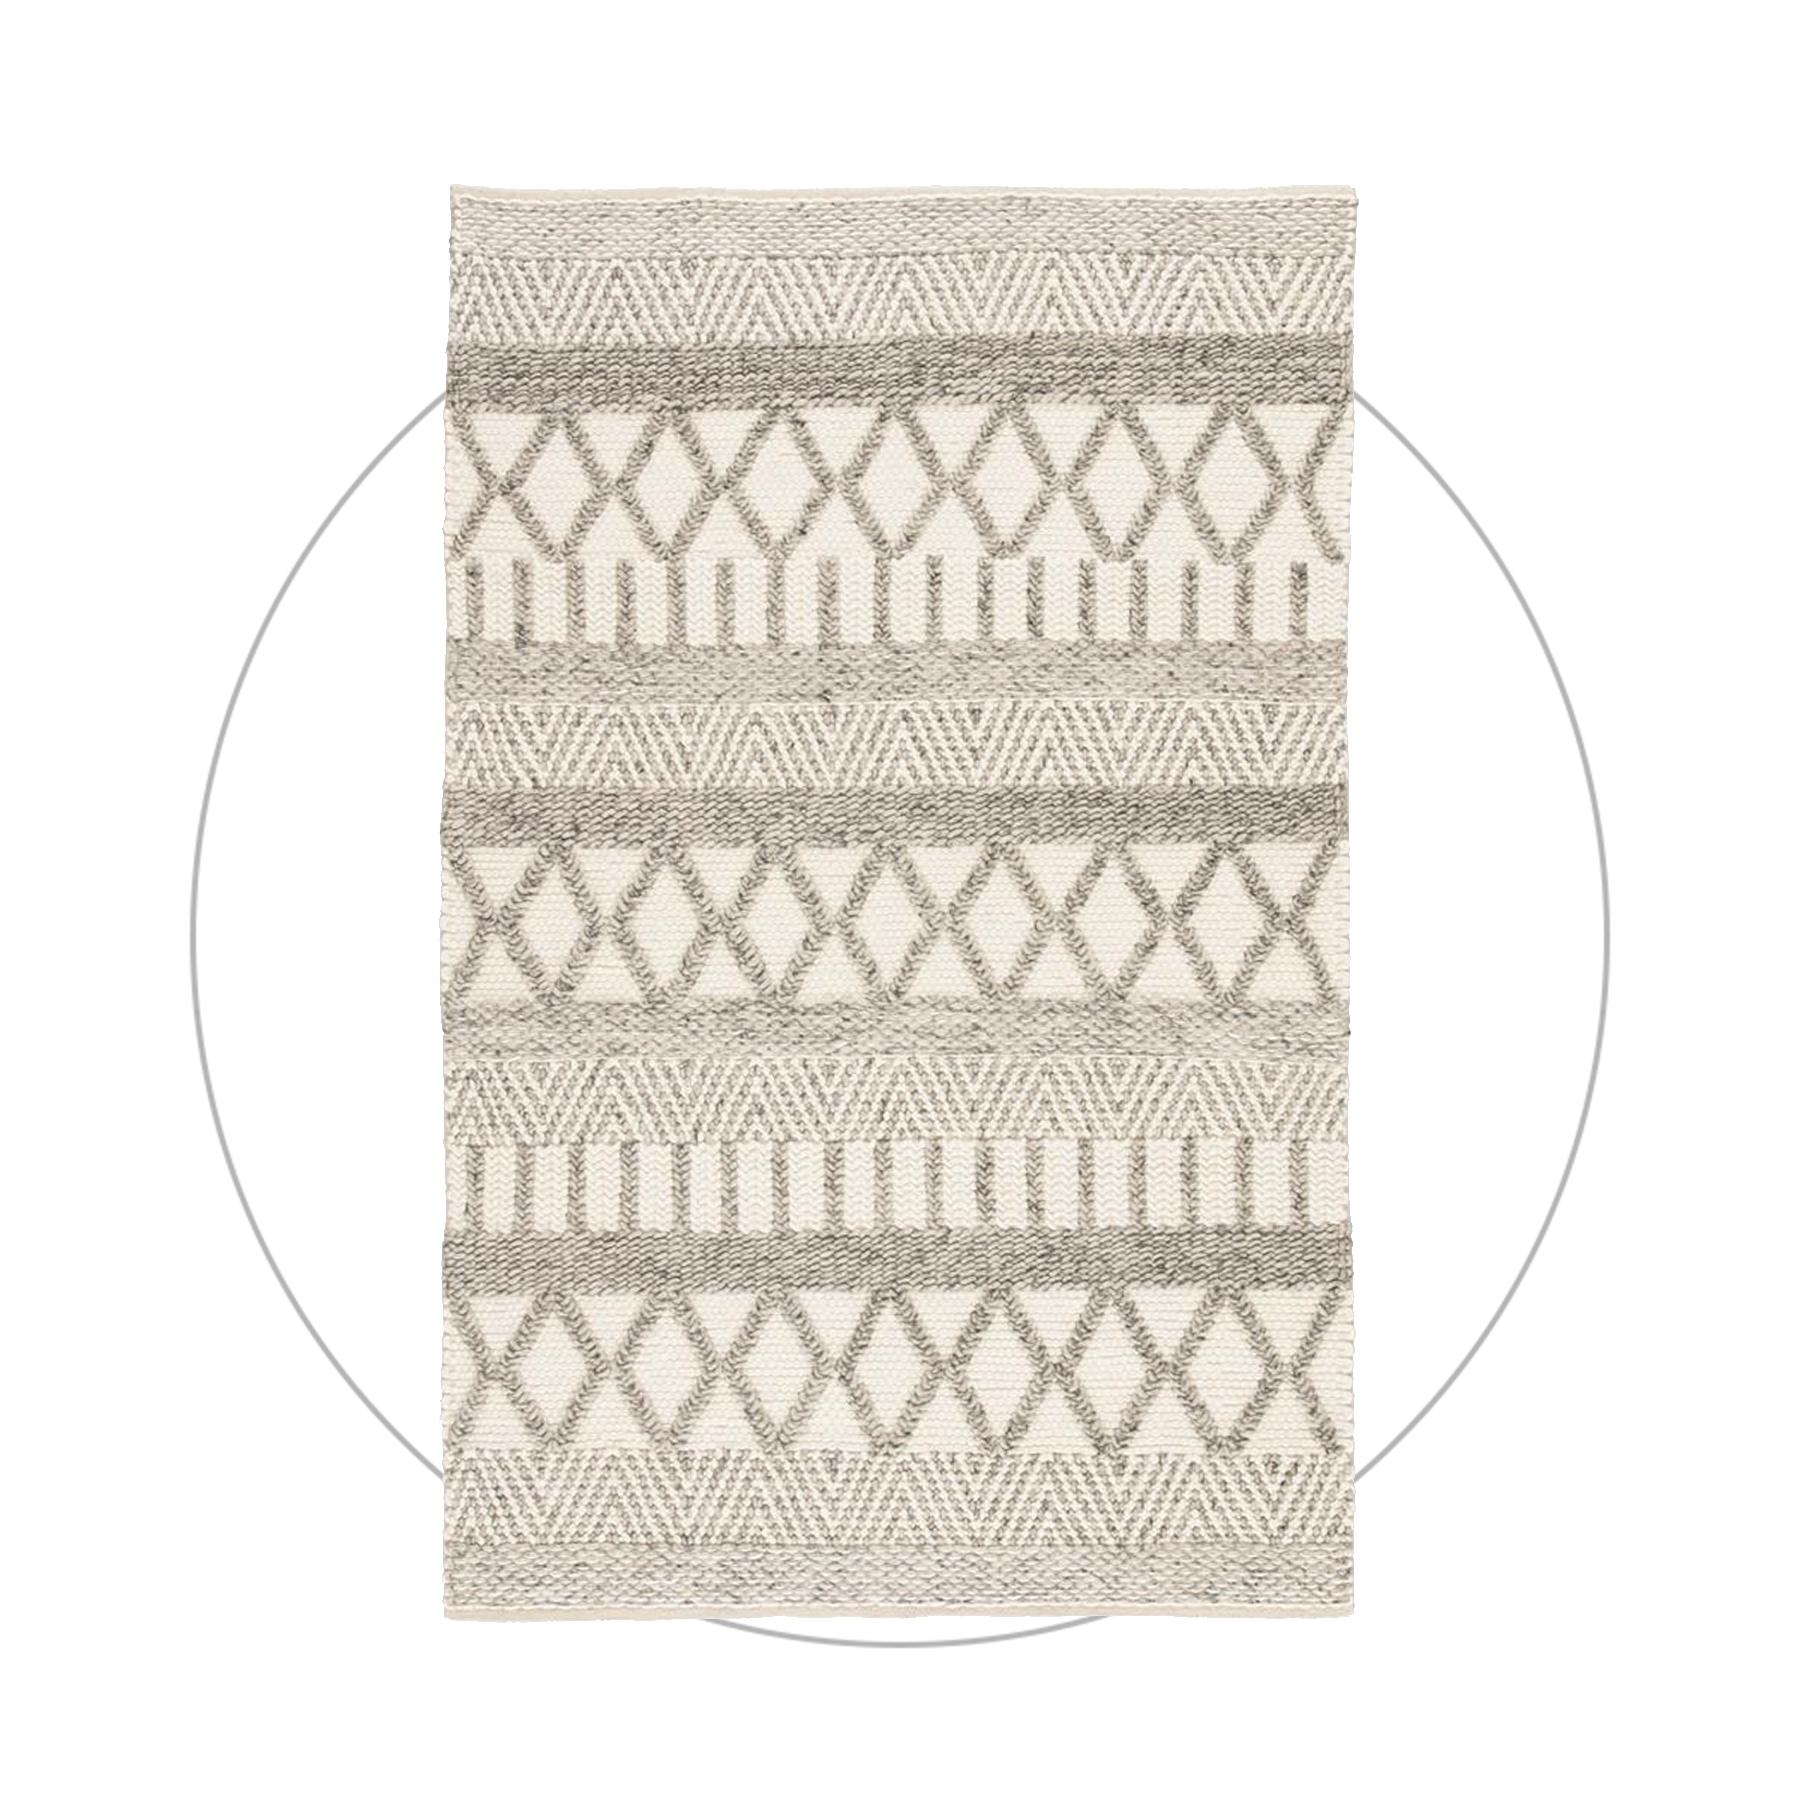 Modern short Pile Carpet Patchwork Gemstone Pattern Wohnzim Grey Turquoise